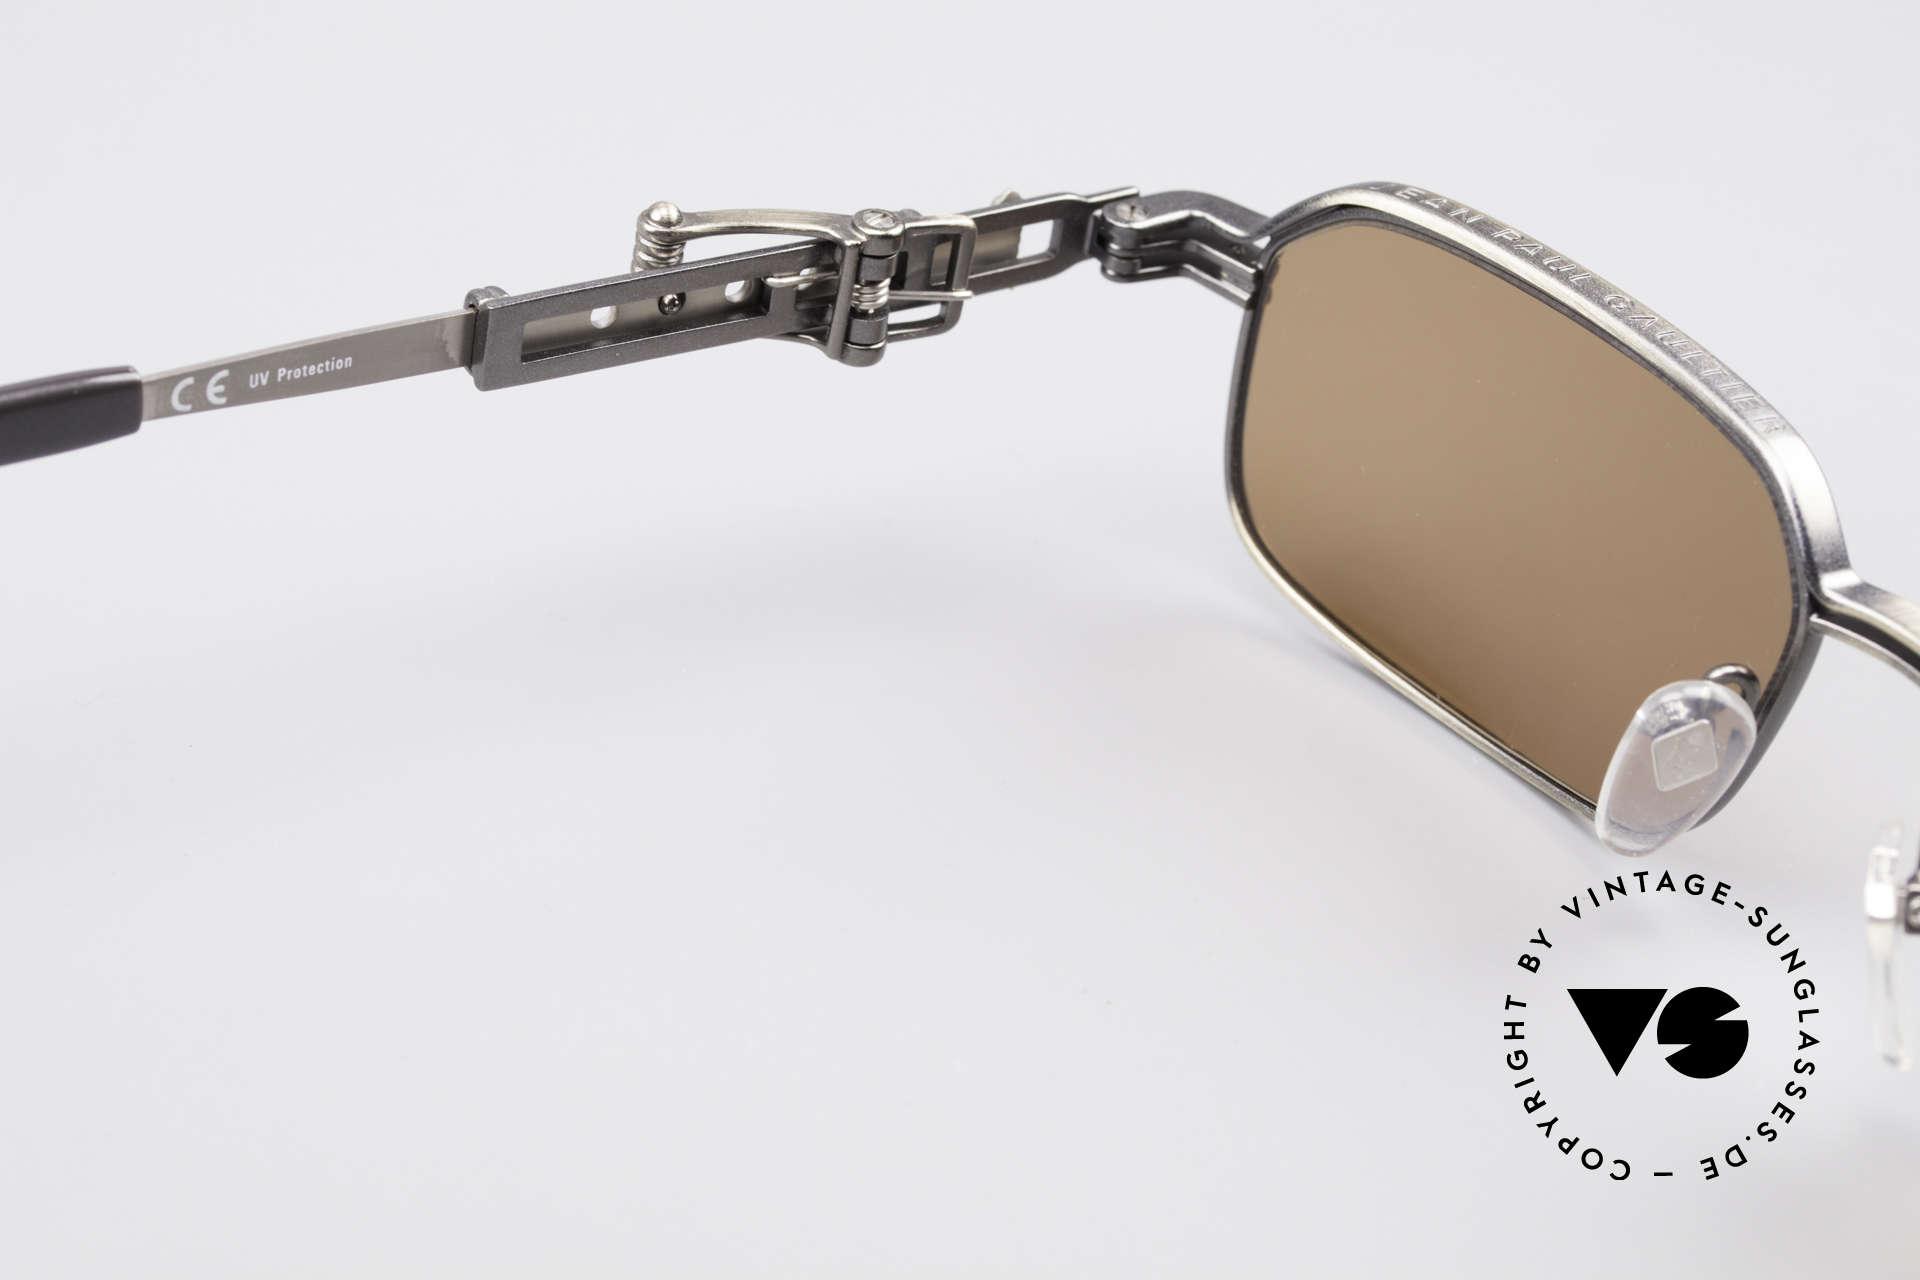 Jean Paul Gaultier 56-0002 Adjustable Frame Belt Buckle, metal frame can be glazed with optical lenses, too, Made for Men